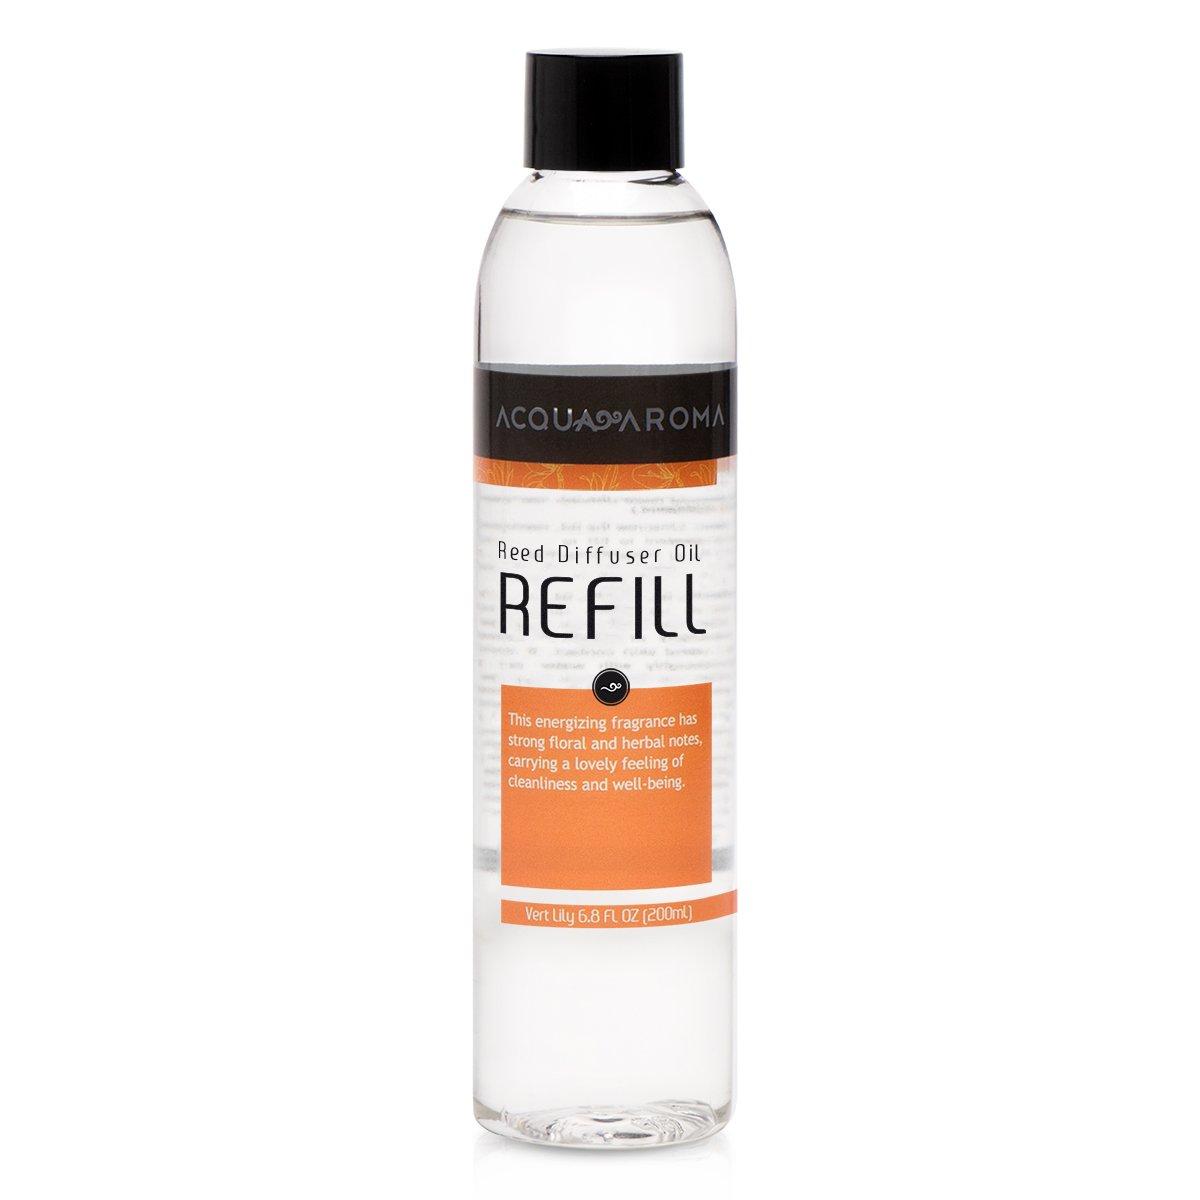 AcquaアロマVert Lily Reed Diffuser Oil Refill 6.8 FL OZ ( 200ml )にはEssencial Oils B01M2XE5CI